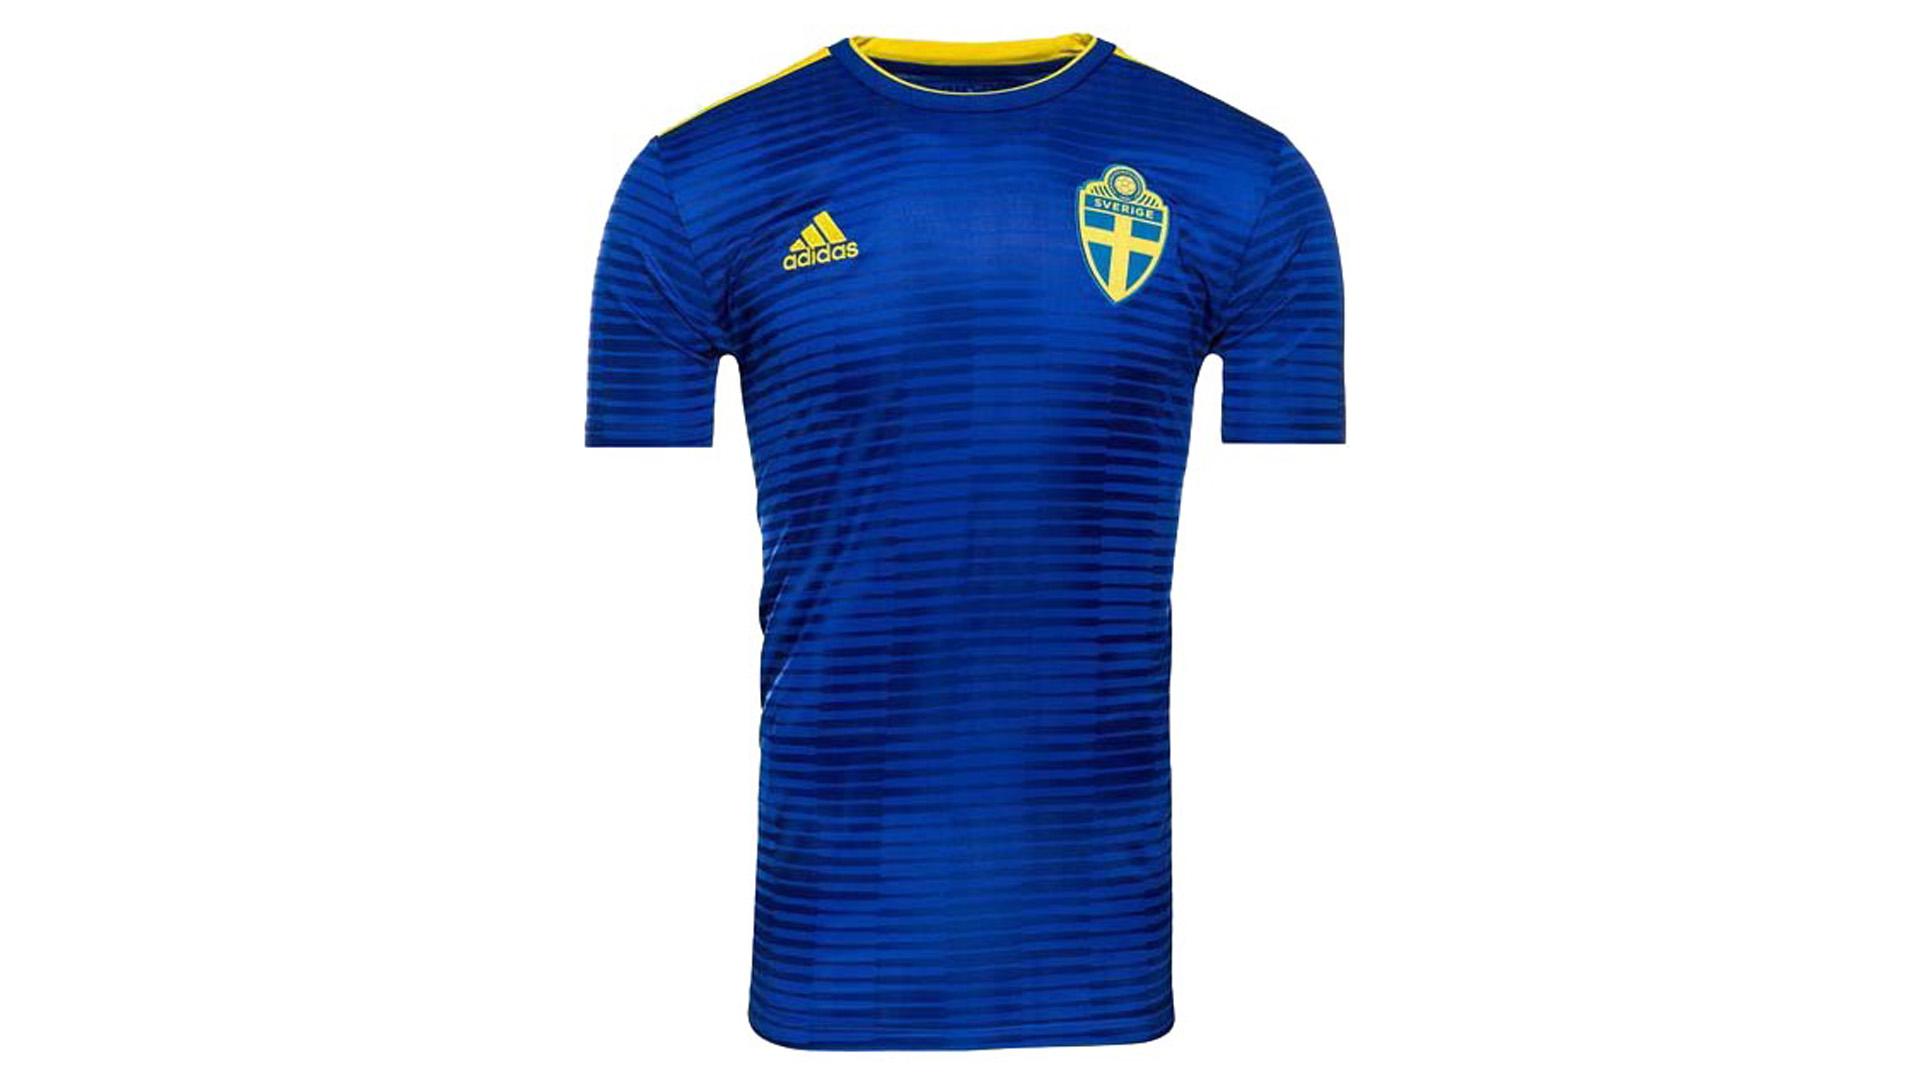 Suecia Camiseta Alternativa 2018 Filtrada Sweden Away Kit Leaked 6633ab033014d